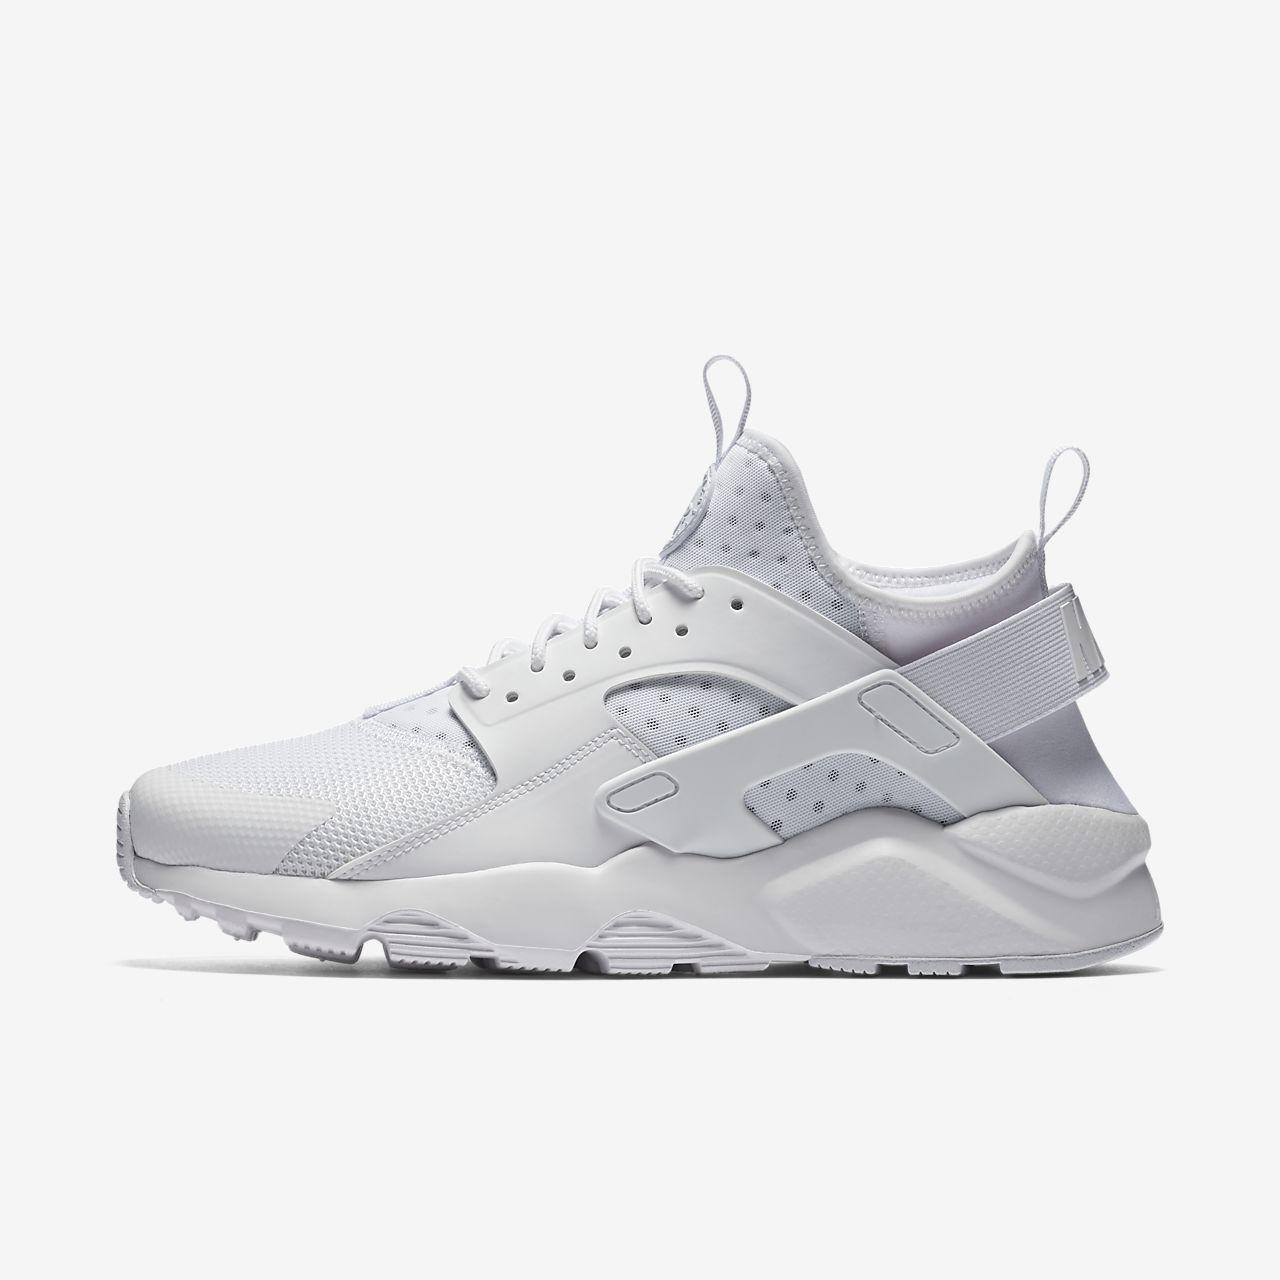 hot sale online 86b72 5e7e7 ... Scarpa Nike Air Huarache Ultra - Uomo